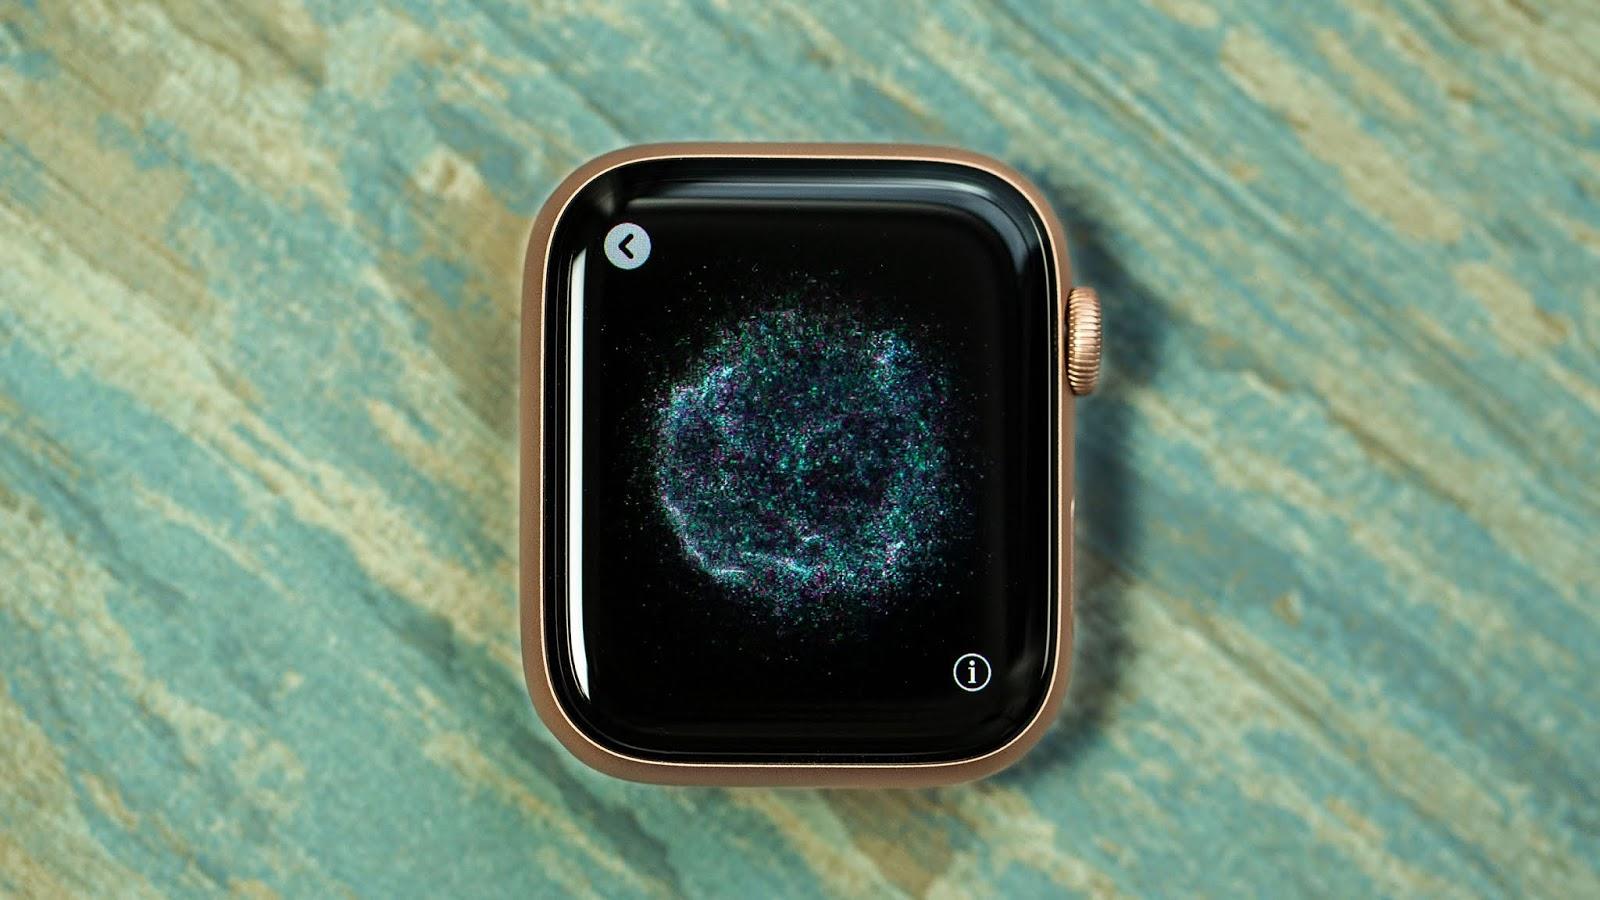 ECG app on your Apple Watch Series 4